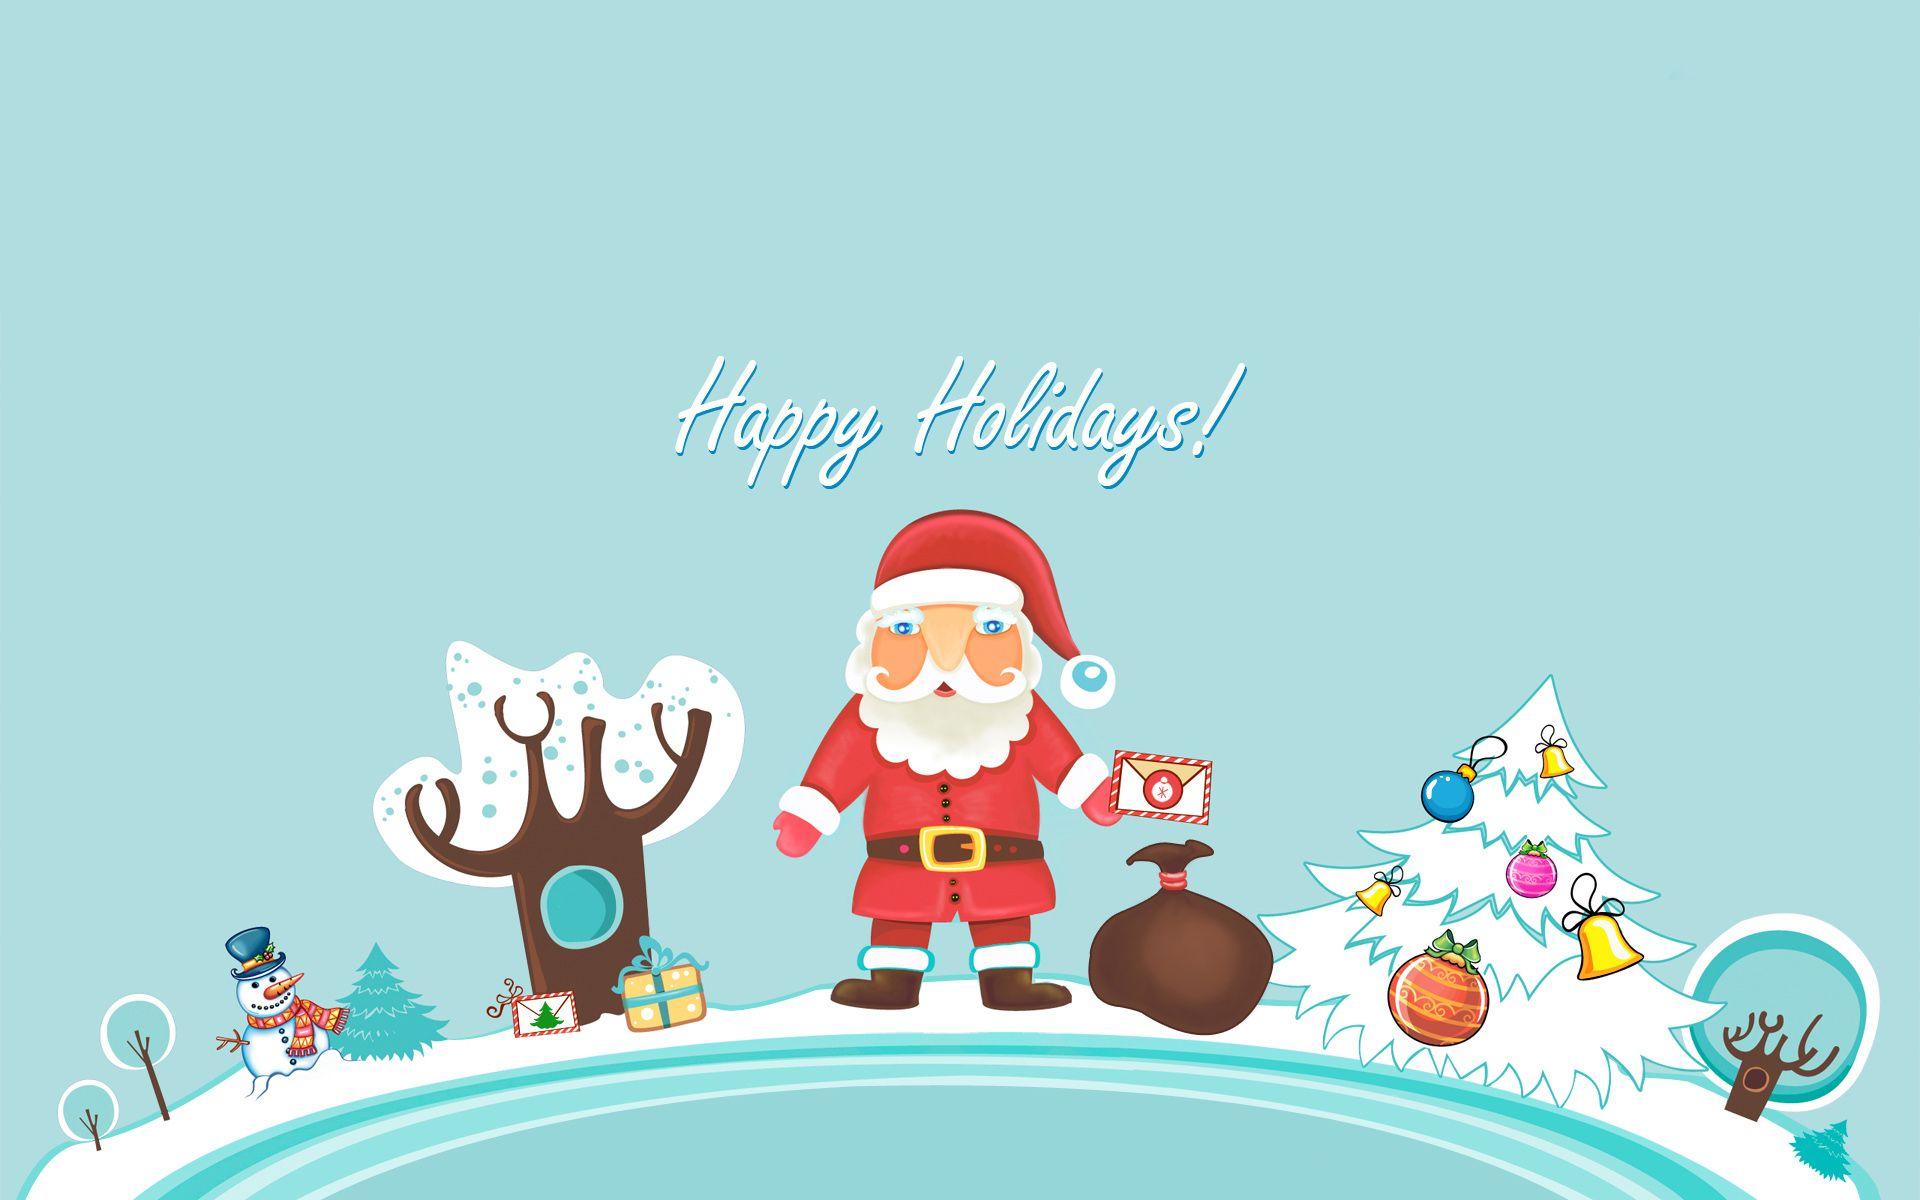 Santa And The Gang Free Holiday Desktop Wallpaper You Ll Never Want To Take Down Christmas Desktop Wallpaper Christmas Wallpaper Hd Holiday Wallpaper